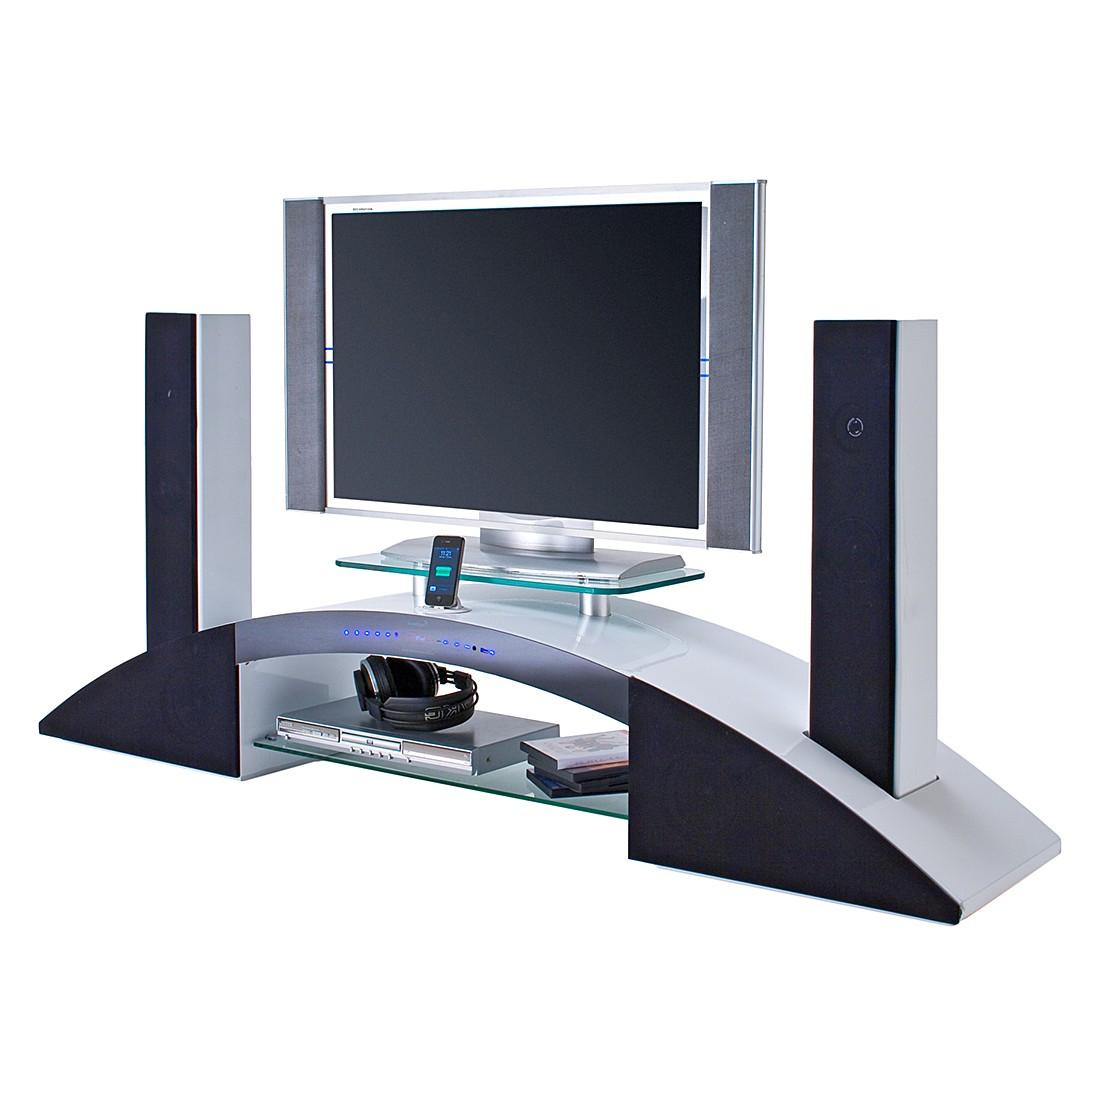 tv lowboard sound dock iv 2 hocht ner 2 mittelt ner 2 subwoofer hochglanz wei lackiert. Black Bedroom Furniture Sets. Home Design Ideas